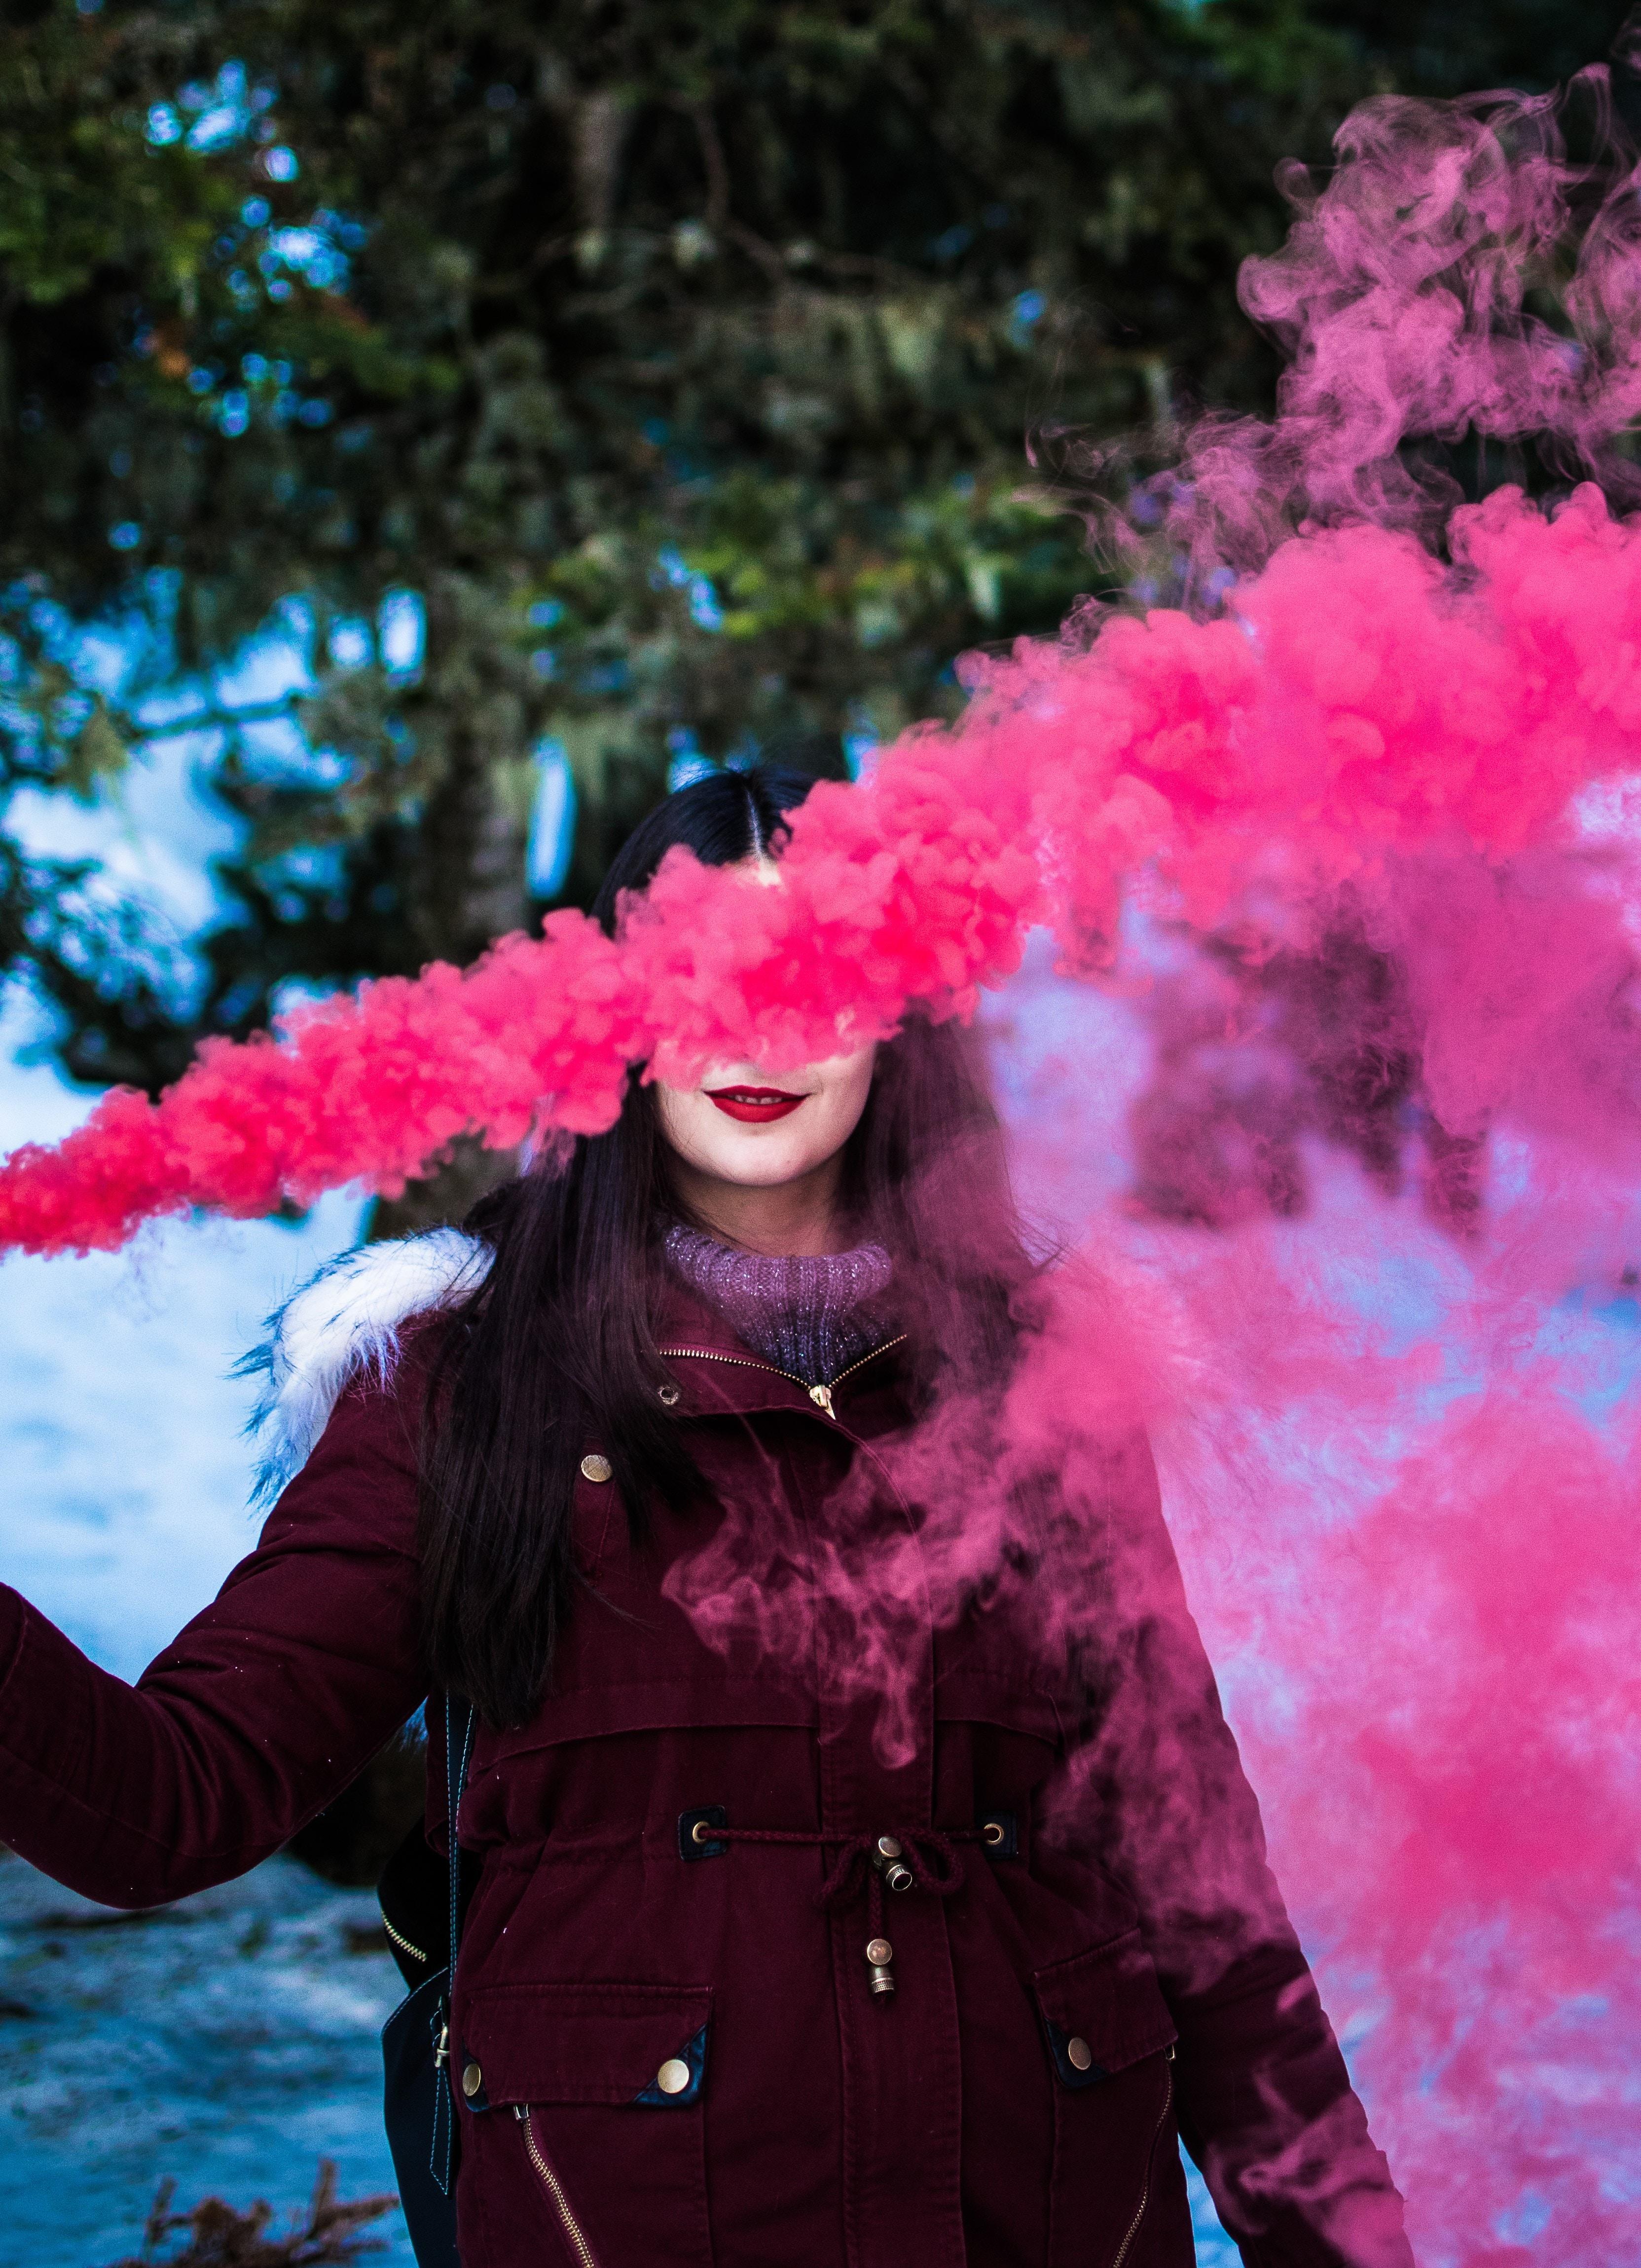 woman in red parka using smoke screen